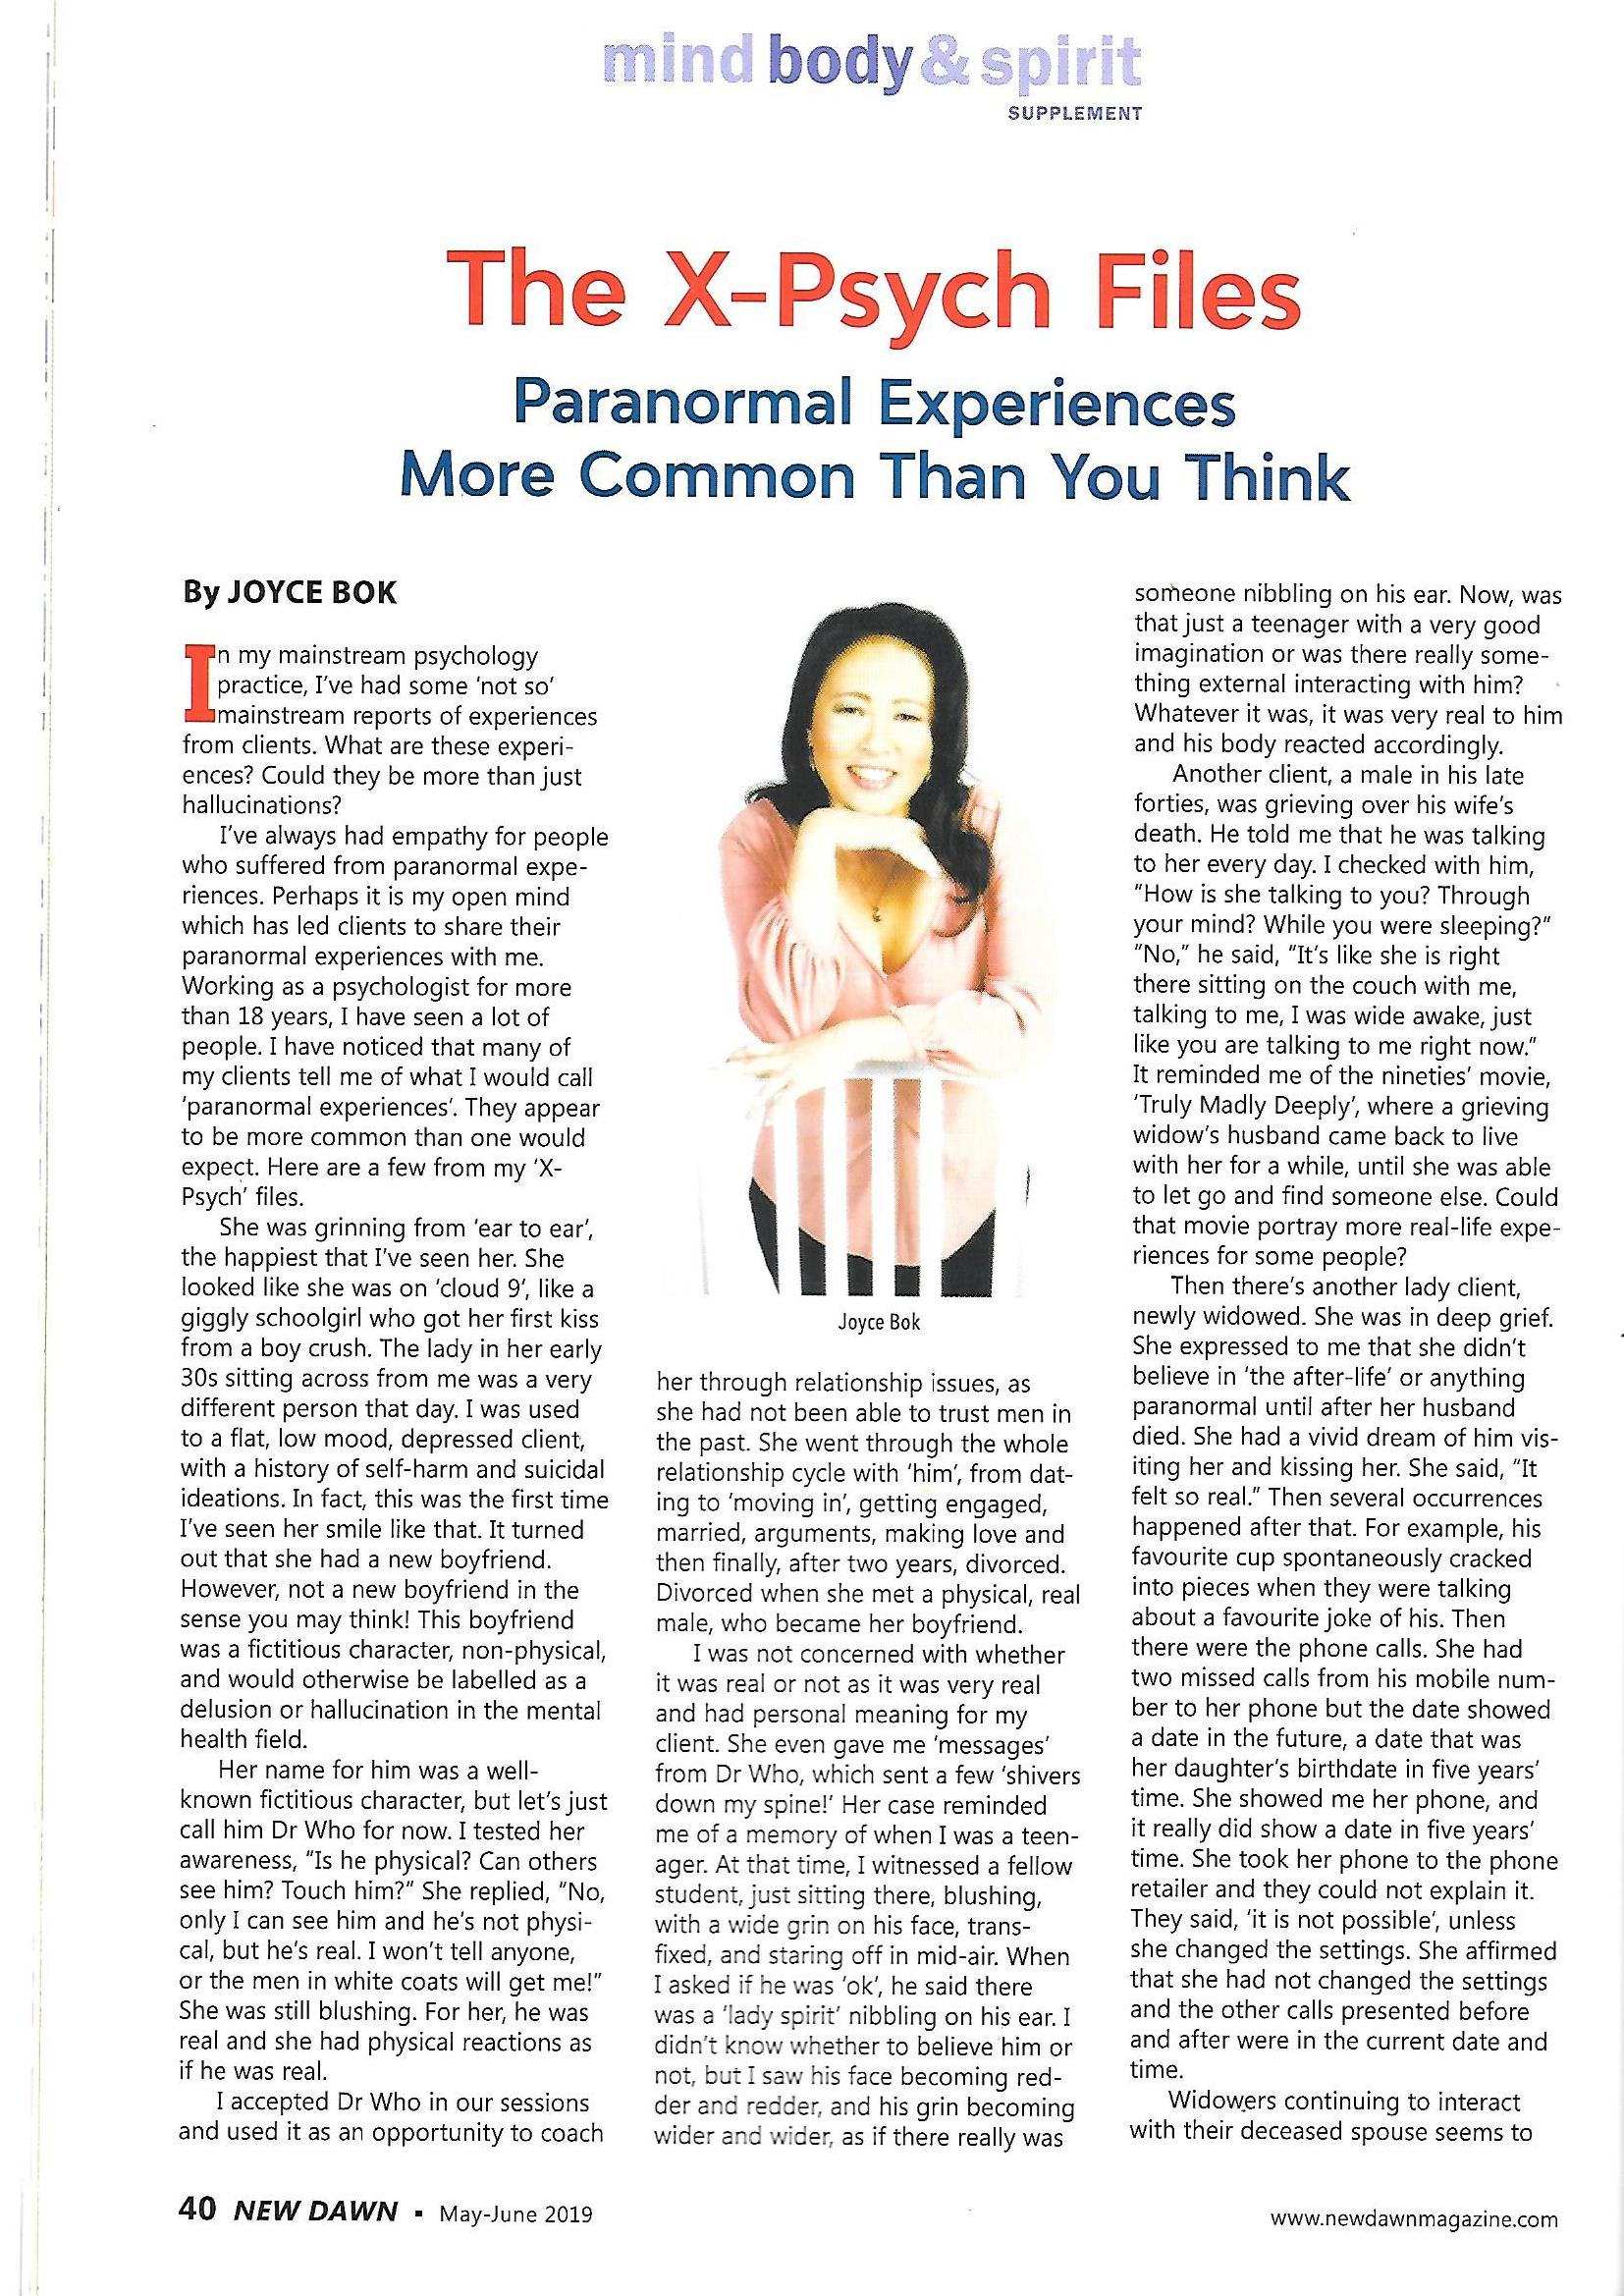 New Dawn article JBOK pg1.jpg